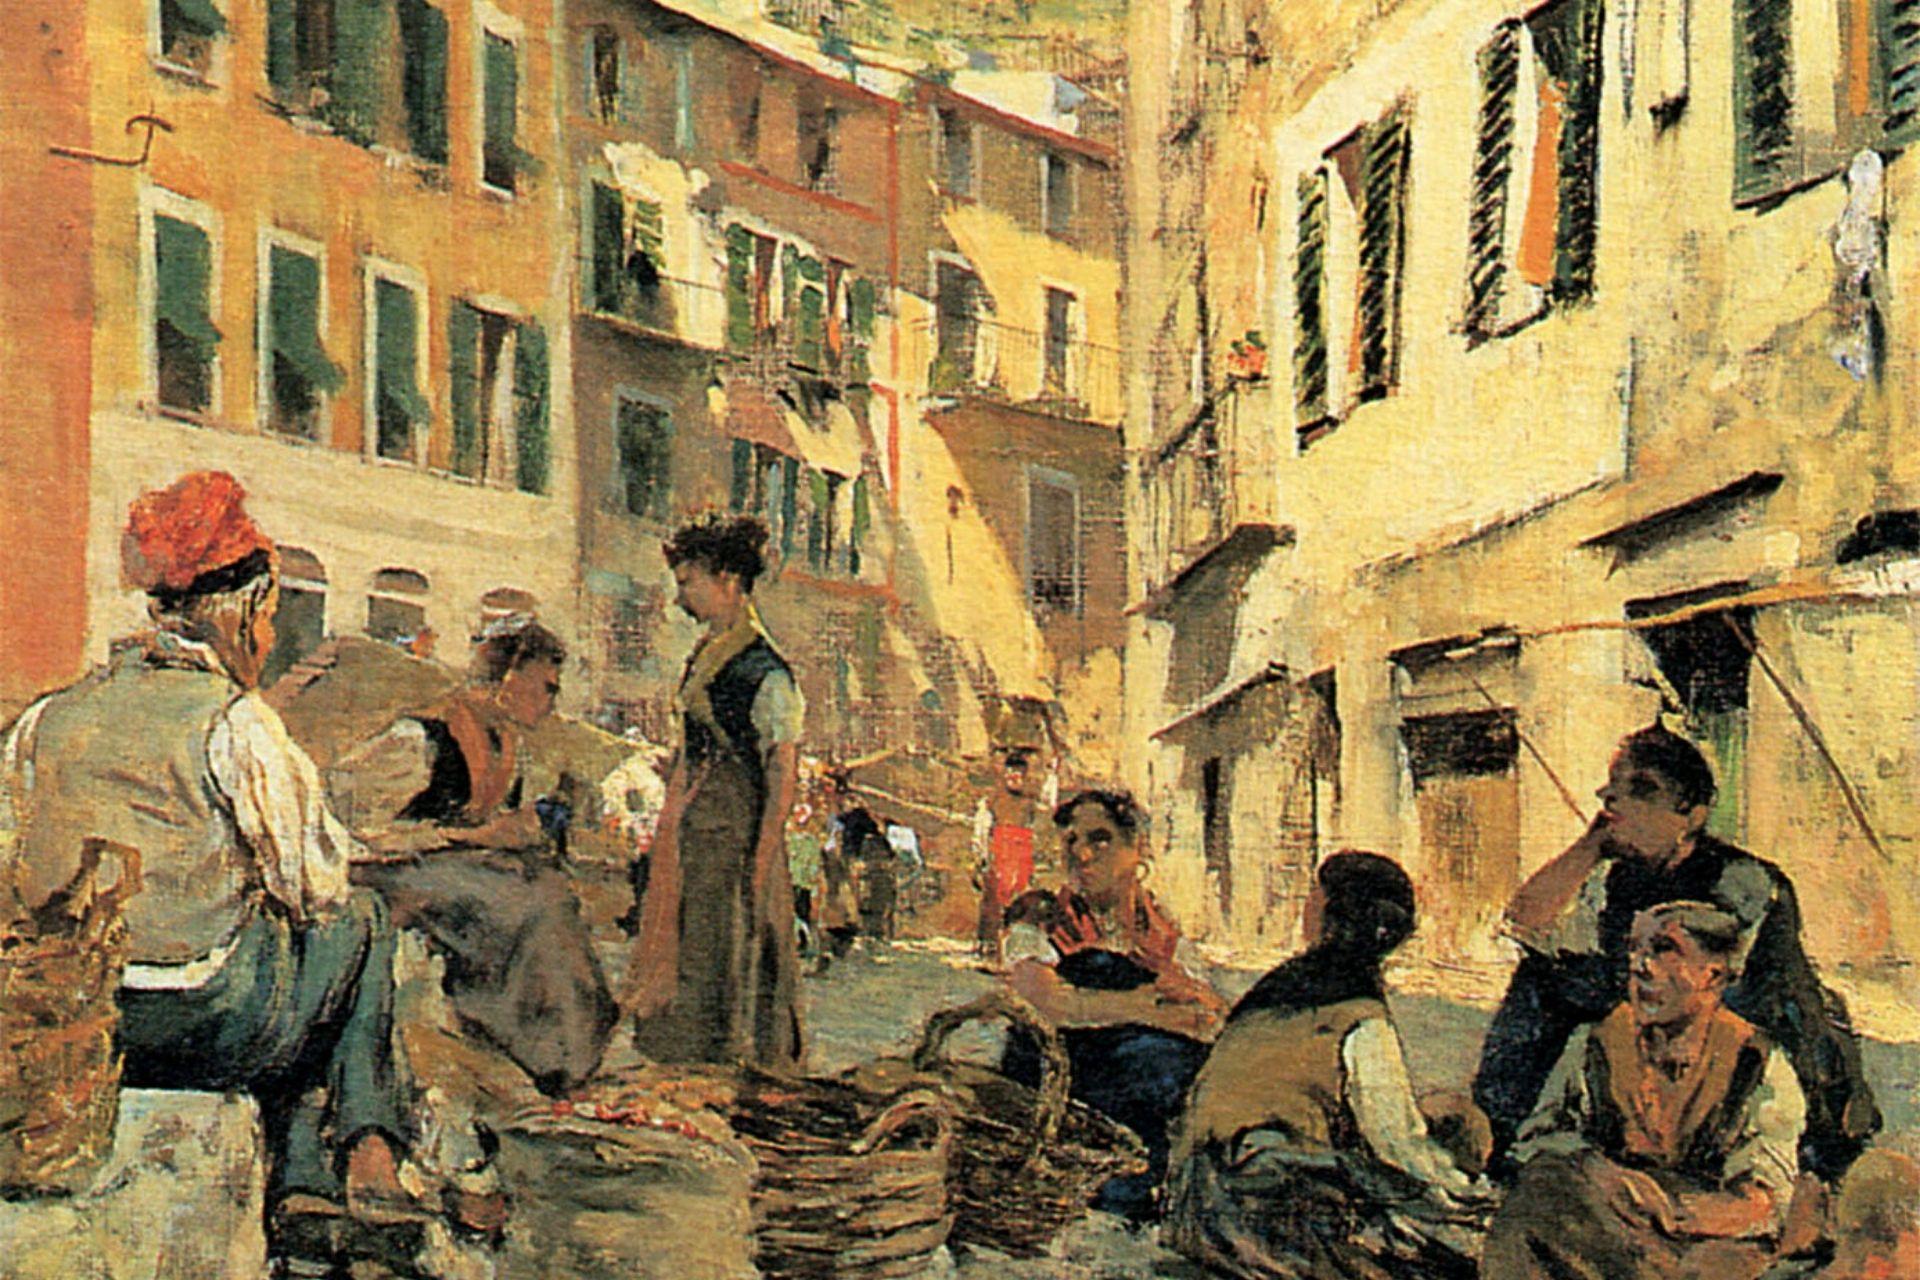 Mostra Macchiaioli Milano